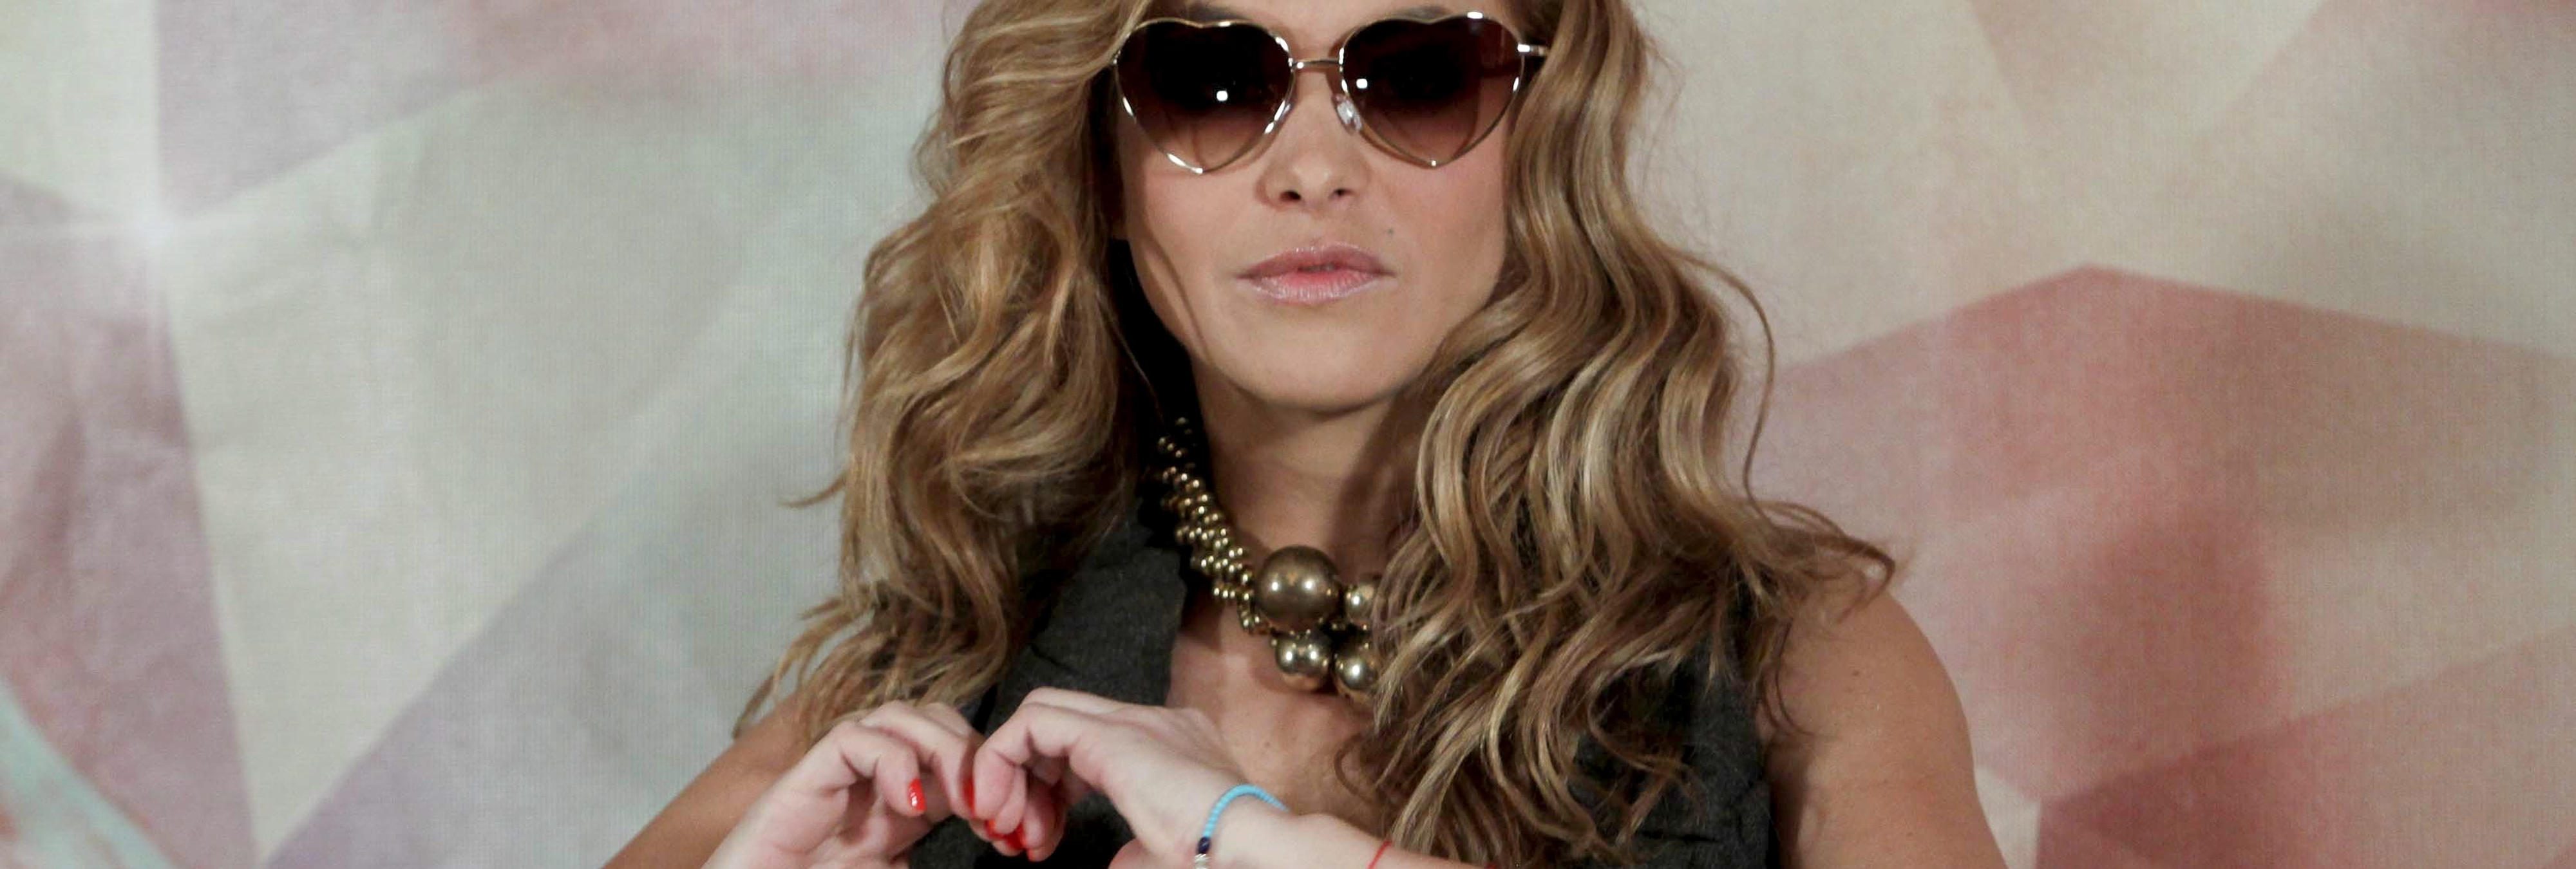 "Paulina Rubio, la reina del ""fail"" latino: sus 4 mejores momentos"